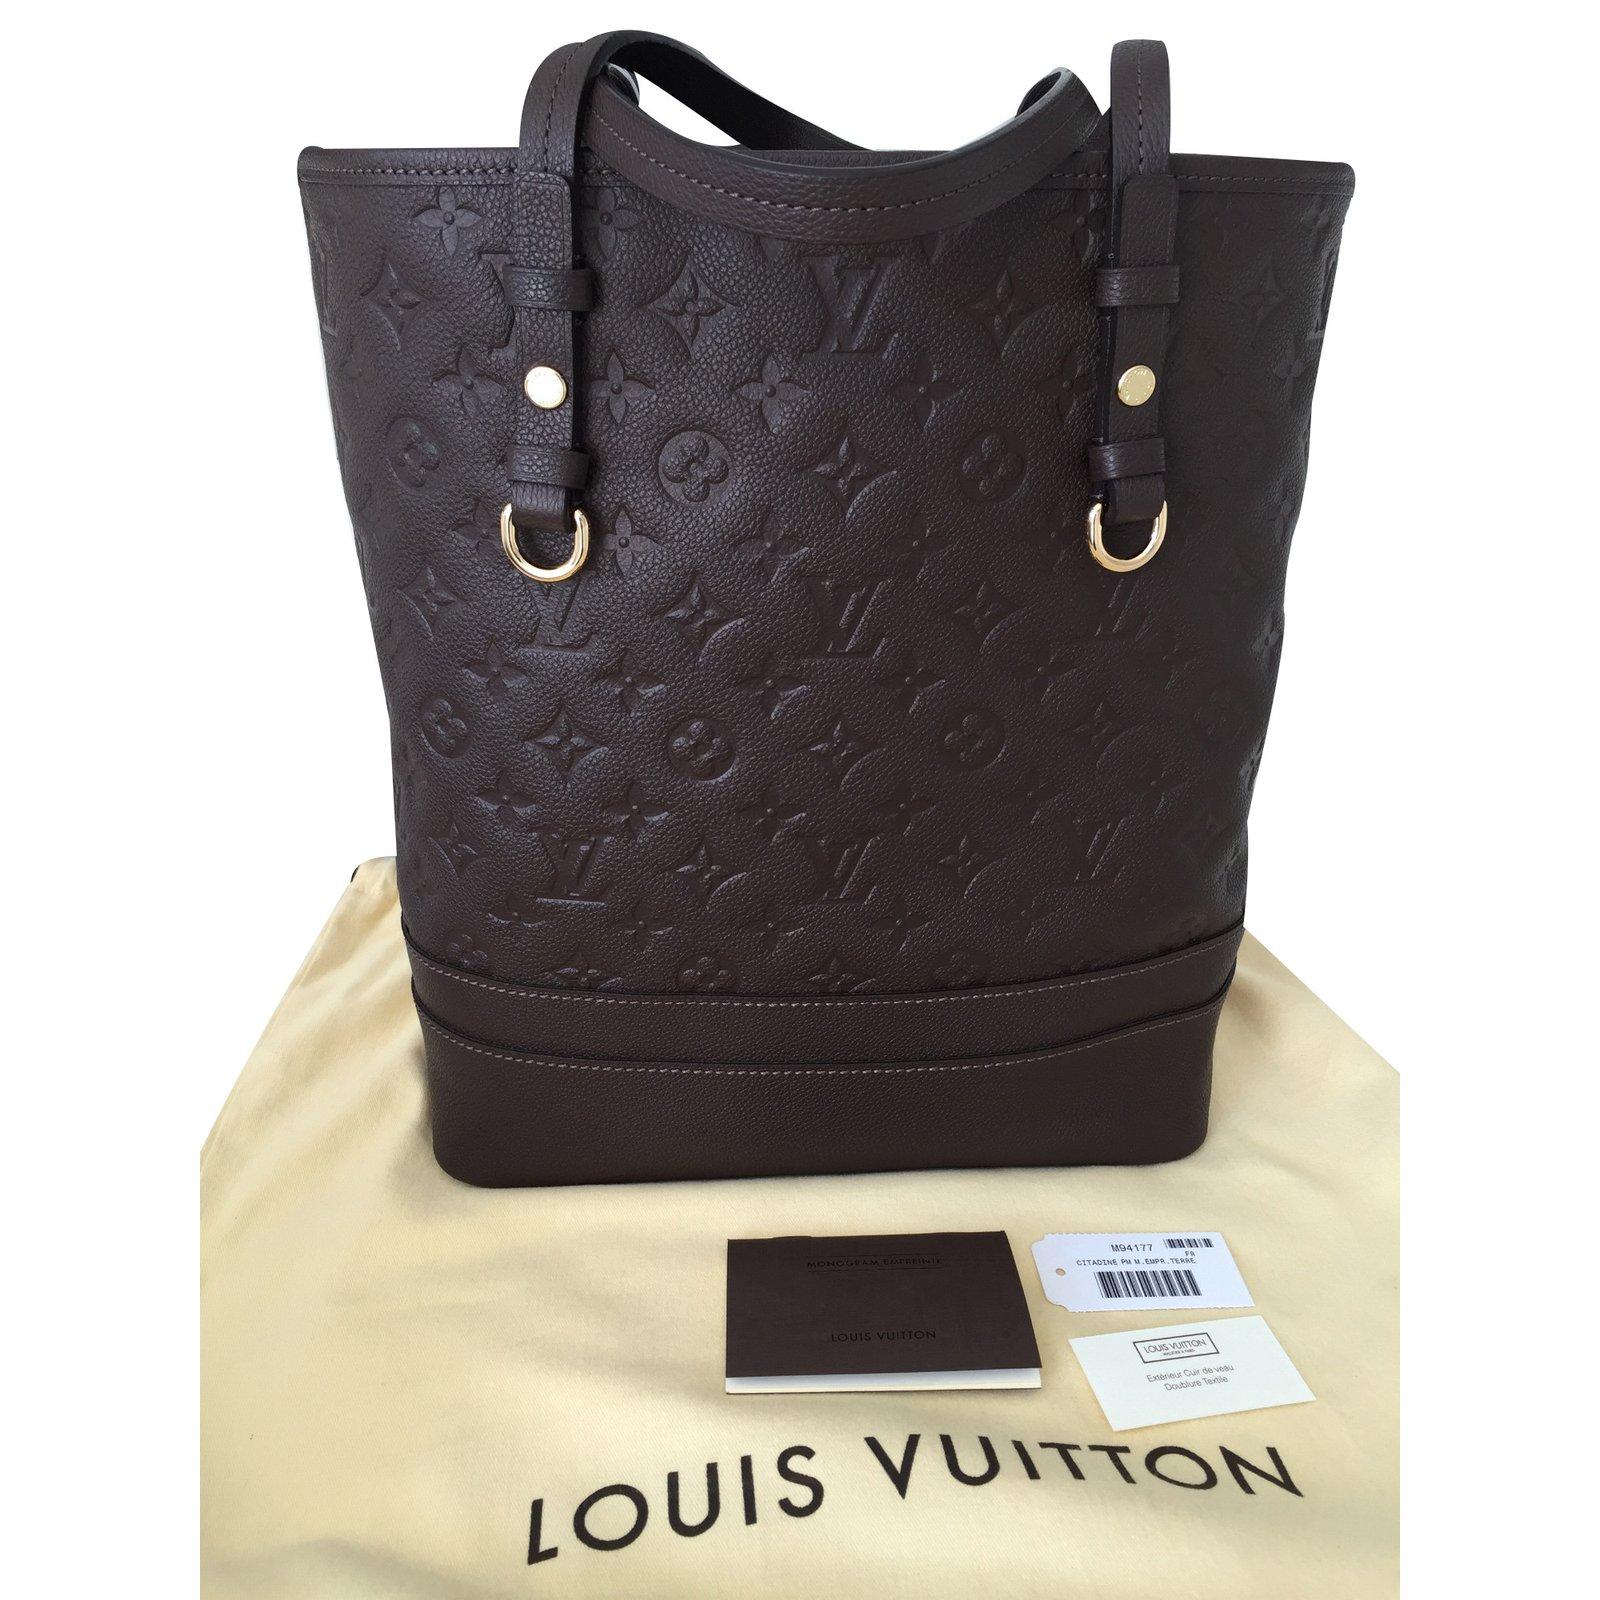 8a7c1c7a14e0 Sacs à main Louis Vuitton Citadine Cuir Chocolat ref.23531 - Joli Closet